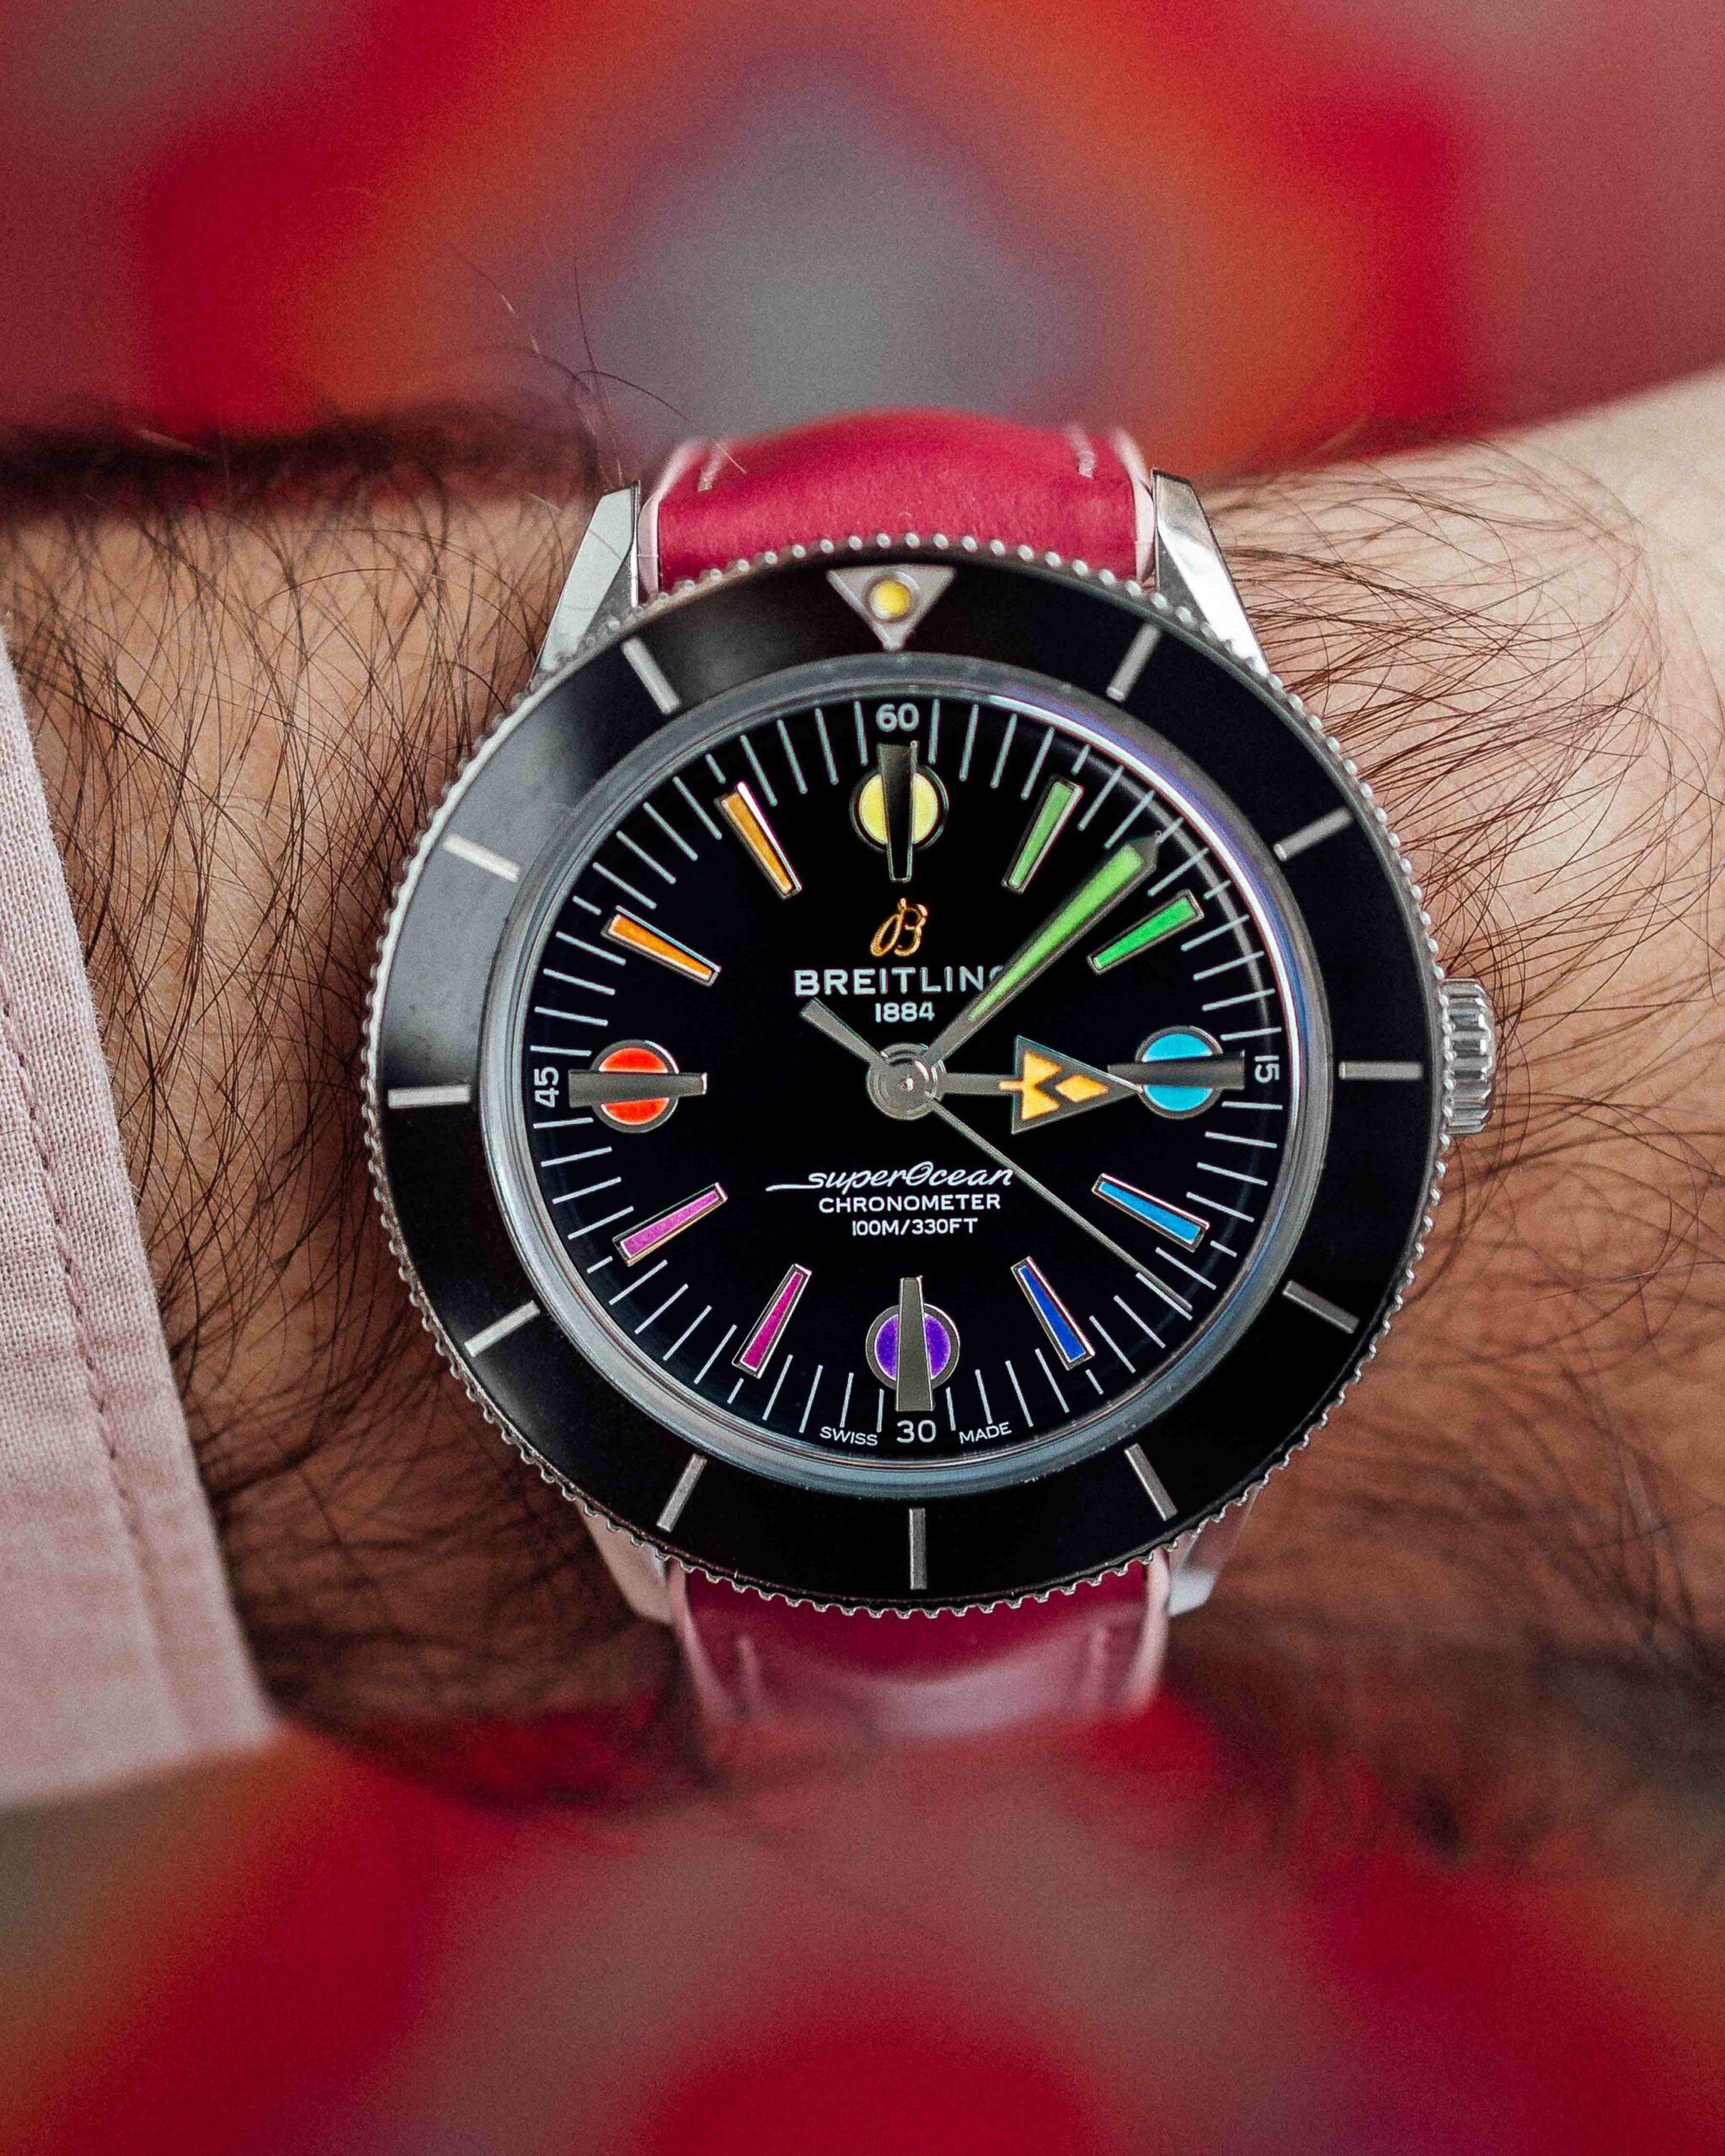 Die besten Uhren unter 5000 Euro: Breitling Superocean Heritage 57